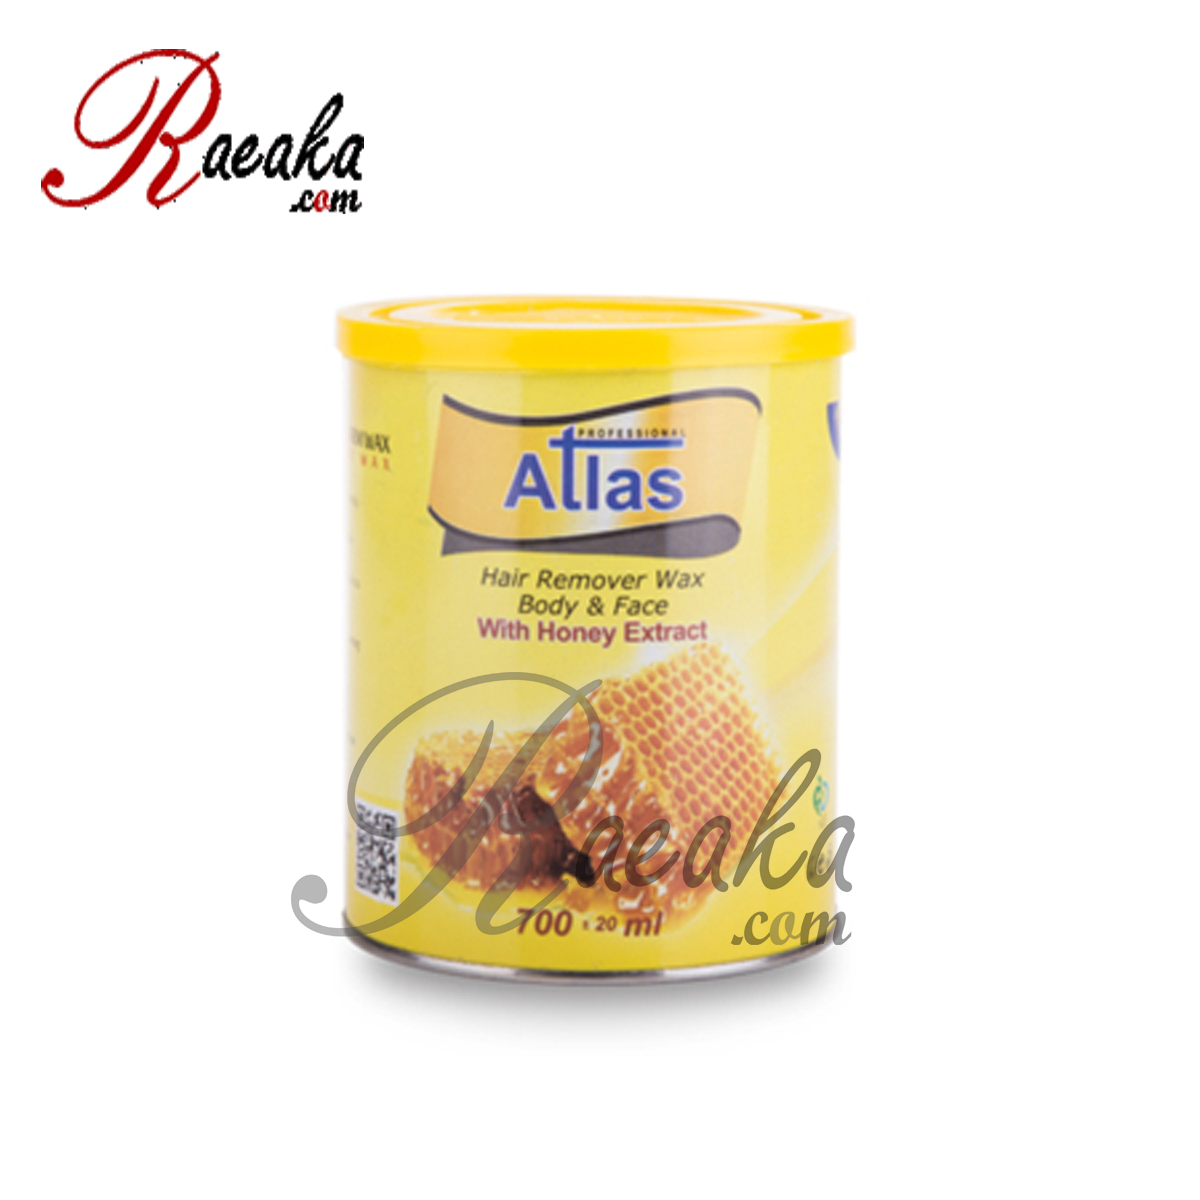 موم دائم کنسروی اطلس با عصاره عسل حجم 700 میلی لیتر